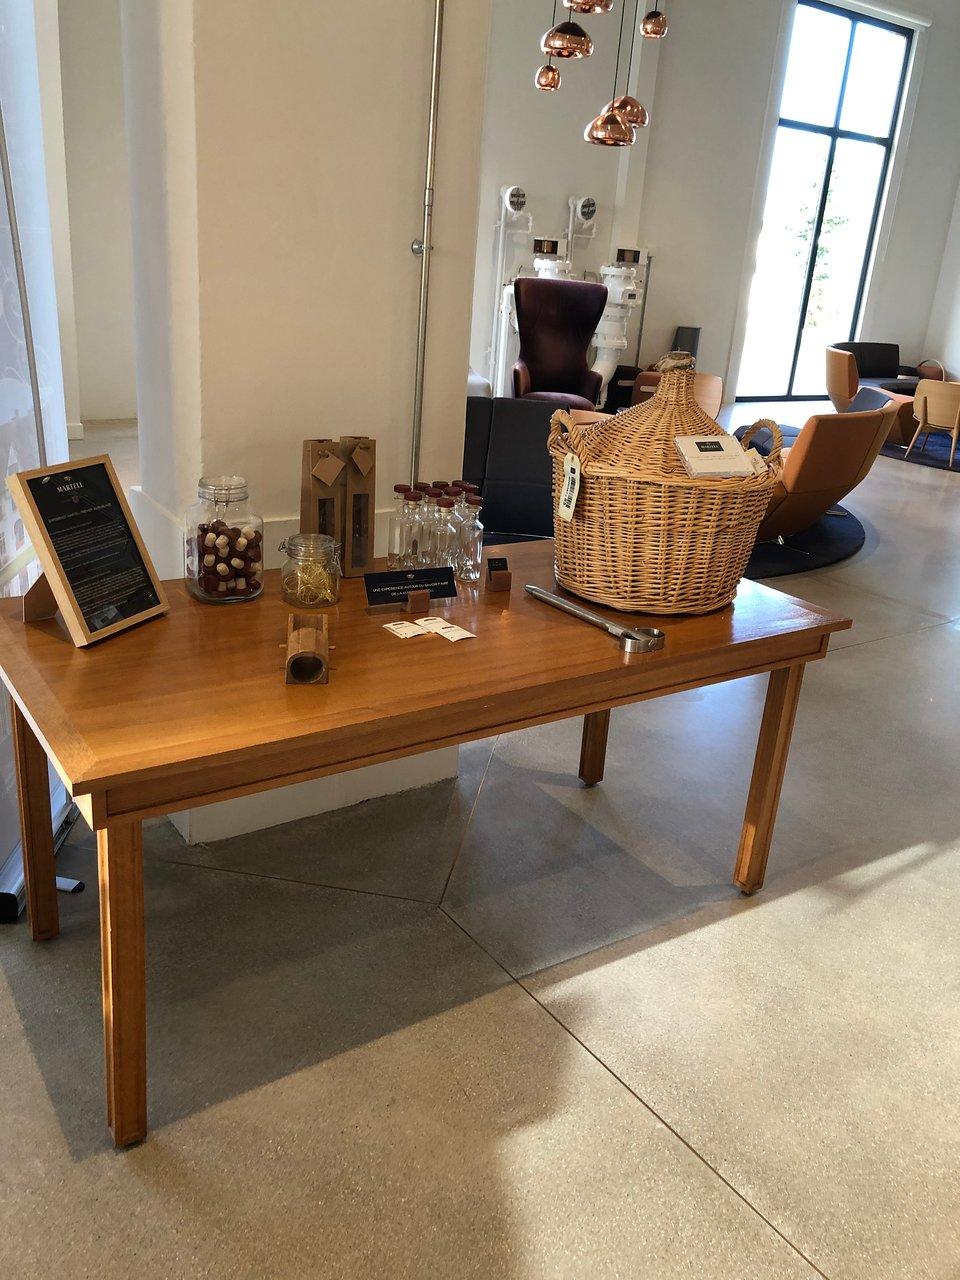 Table Jardin Design Beau Martell Cognac S Visitors Center Коньяк Ручшие советы